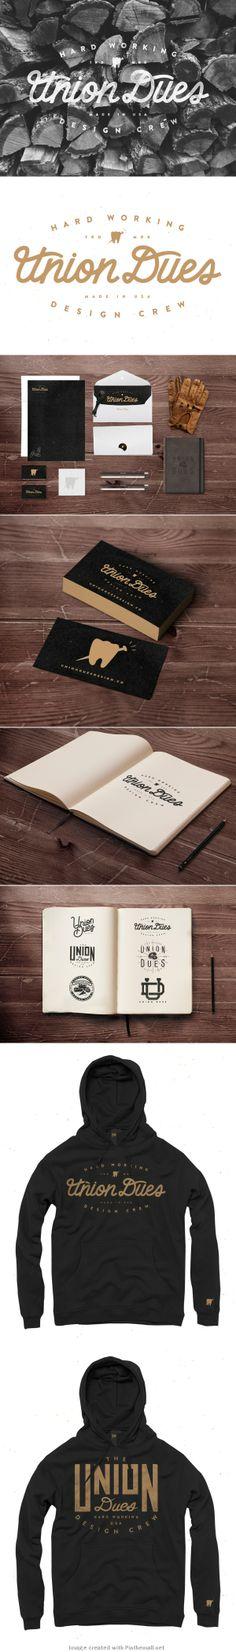 Corporate design logo sketchbook business card letter head envelop sweater hoodie